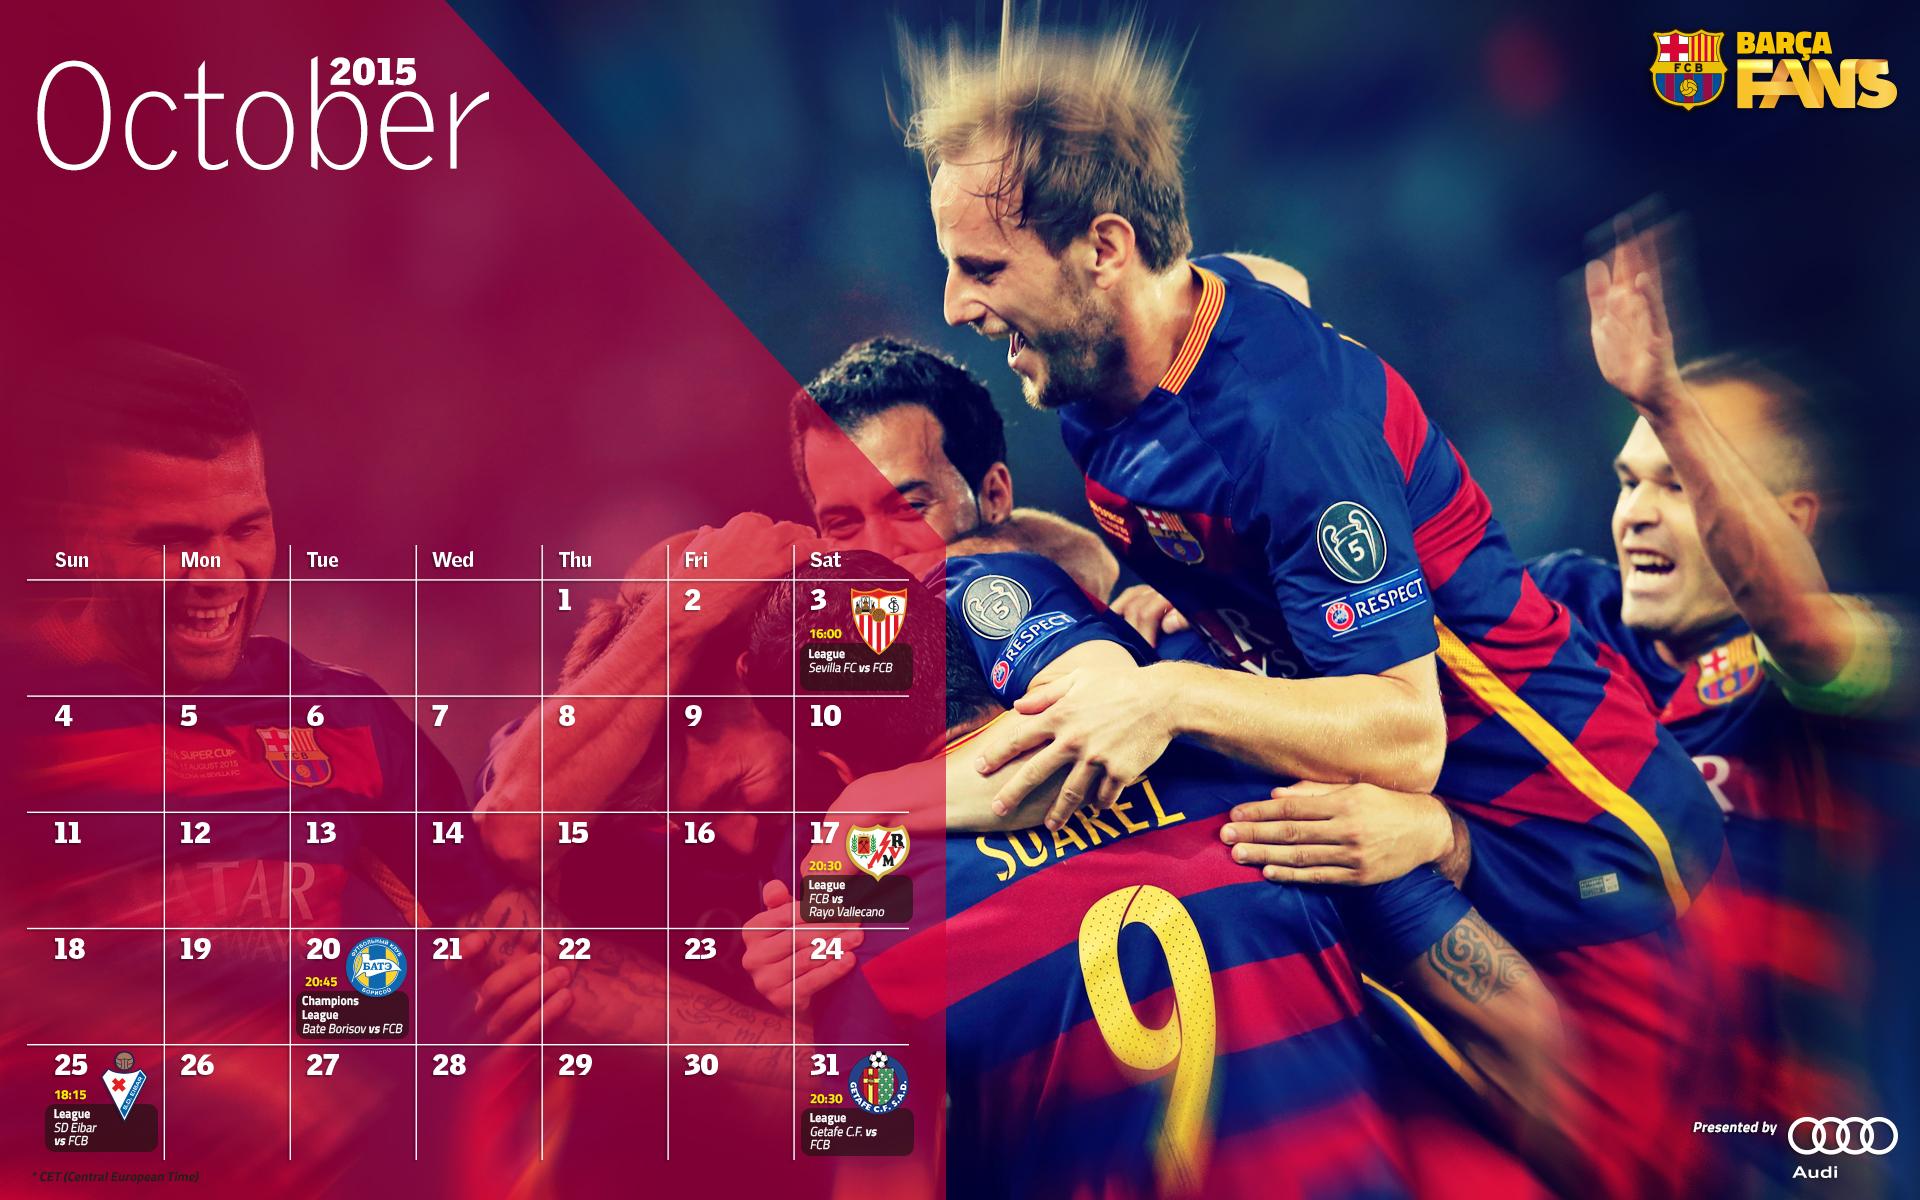 Barcelona Calendar Wallpaper : Infografika kalendár zápasov na október forcabarca sk